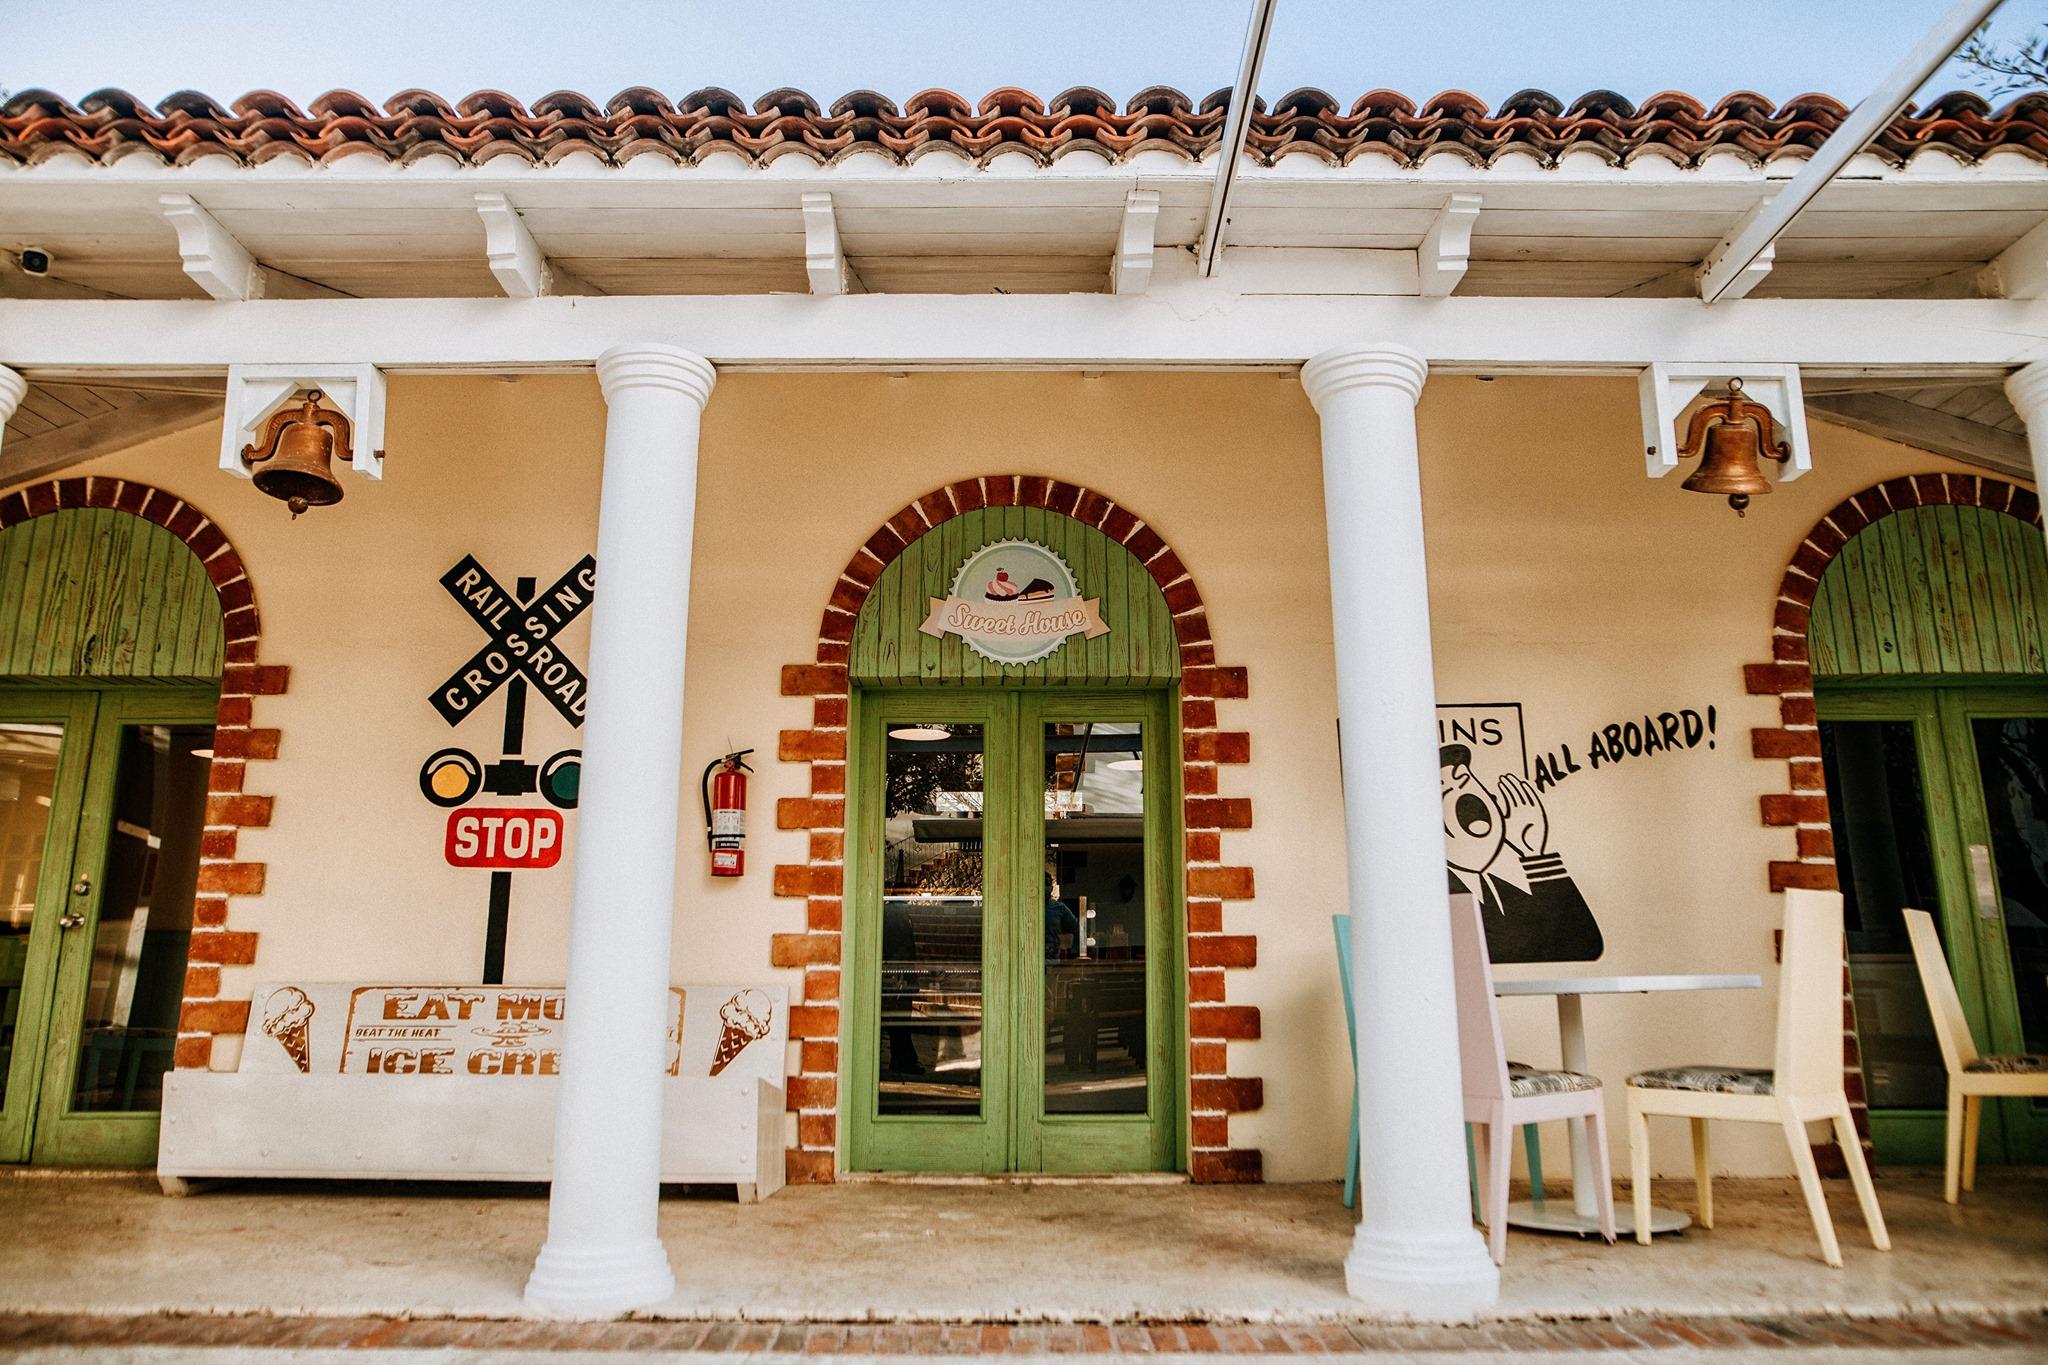 restaurants in punta cana, best restaurants in punta cana, punta cana food, where to eat in punta cana, sanctuary town